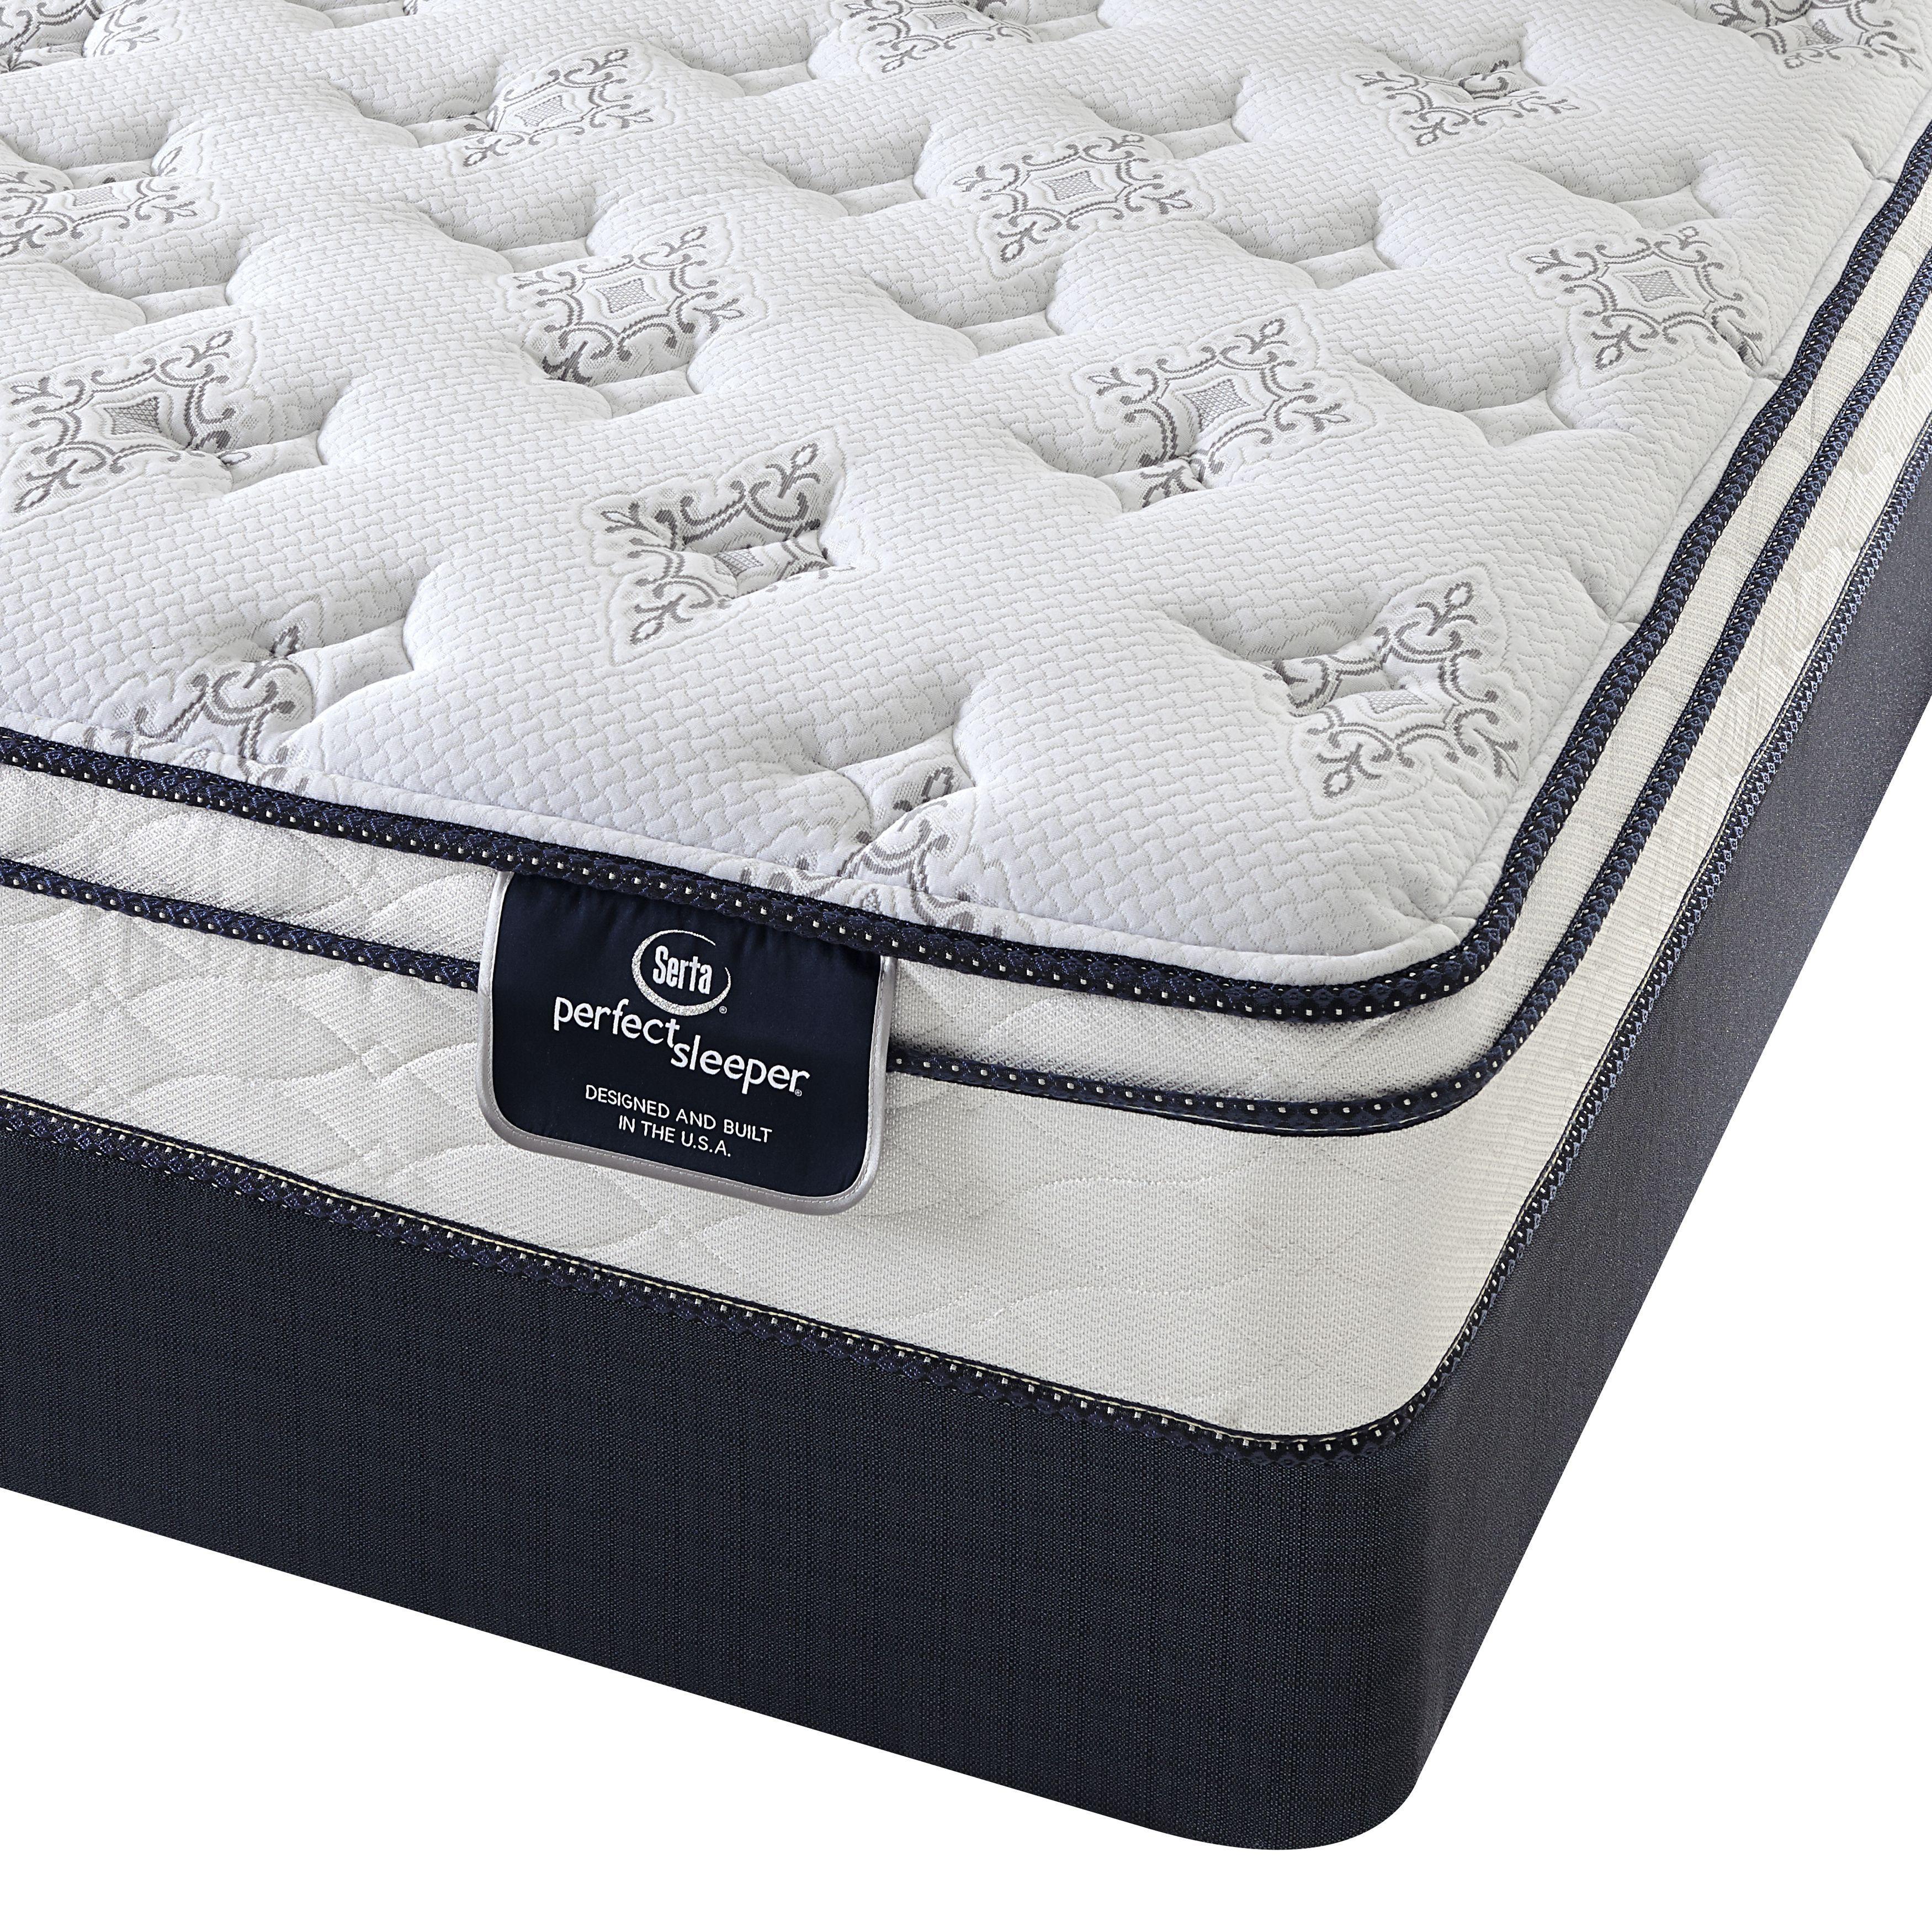 Serta Perfect Sleeper Incite Euro Top Fullsize Mattress